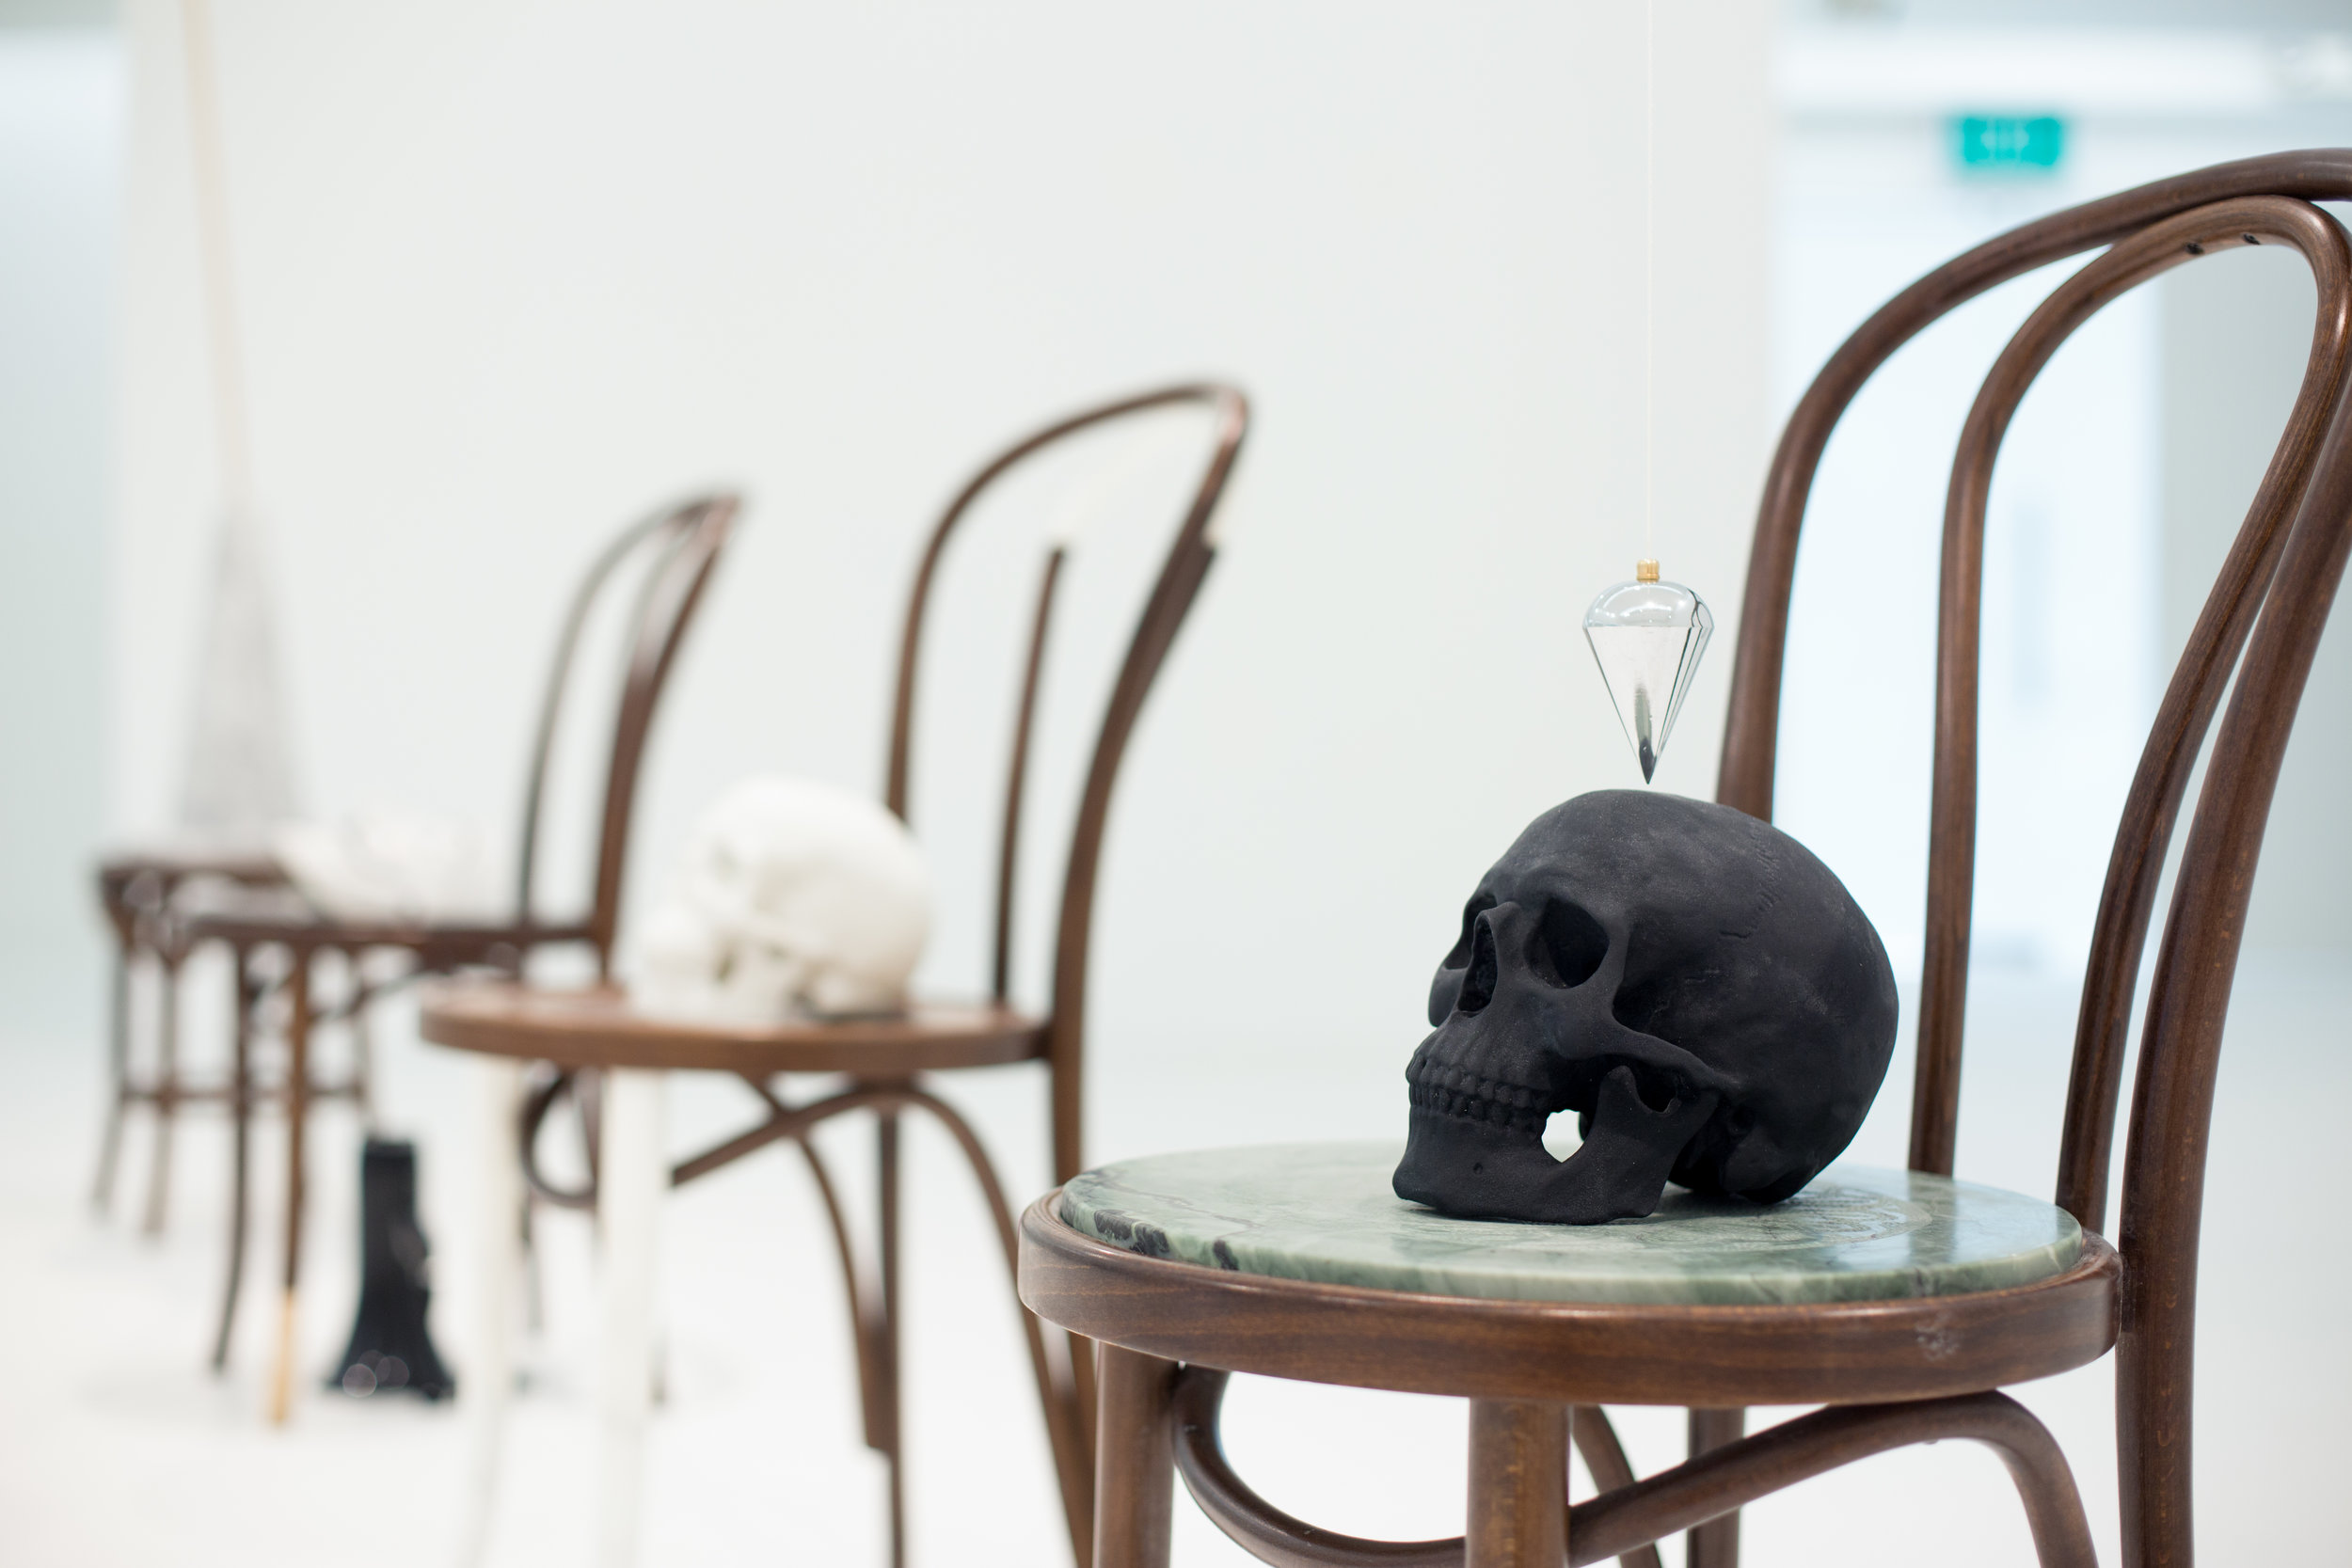 Golem Effect  2016 Fameg Bentwood chair, Pillsborough Green, Wombeyan, nylon digital print, steel and string 90 x 40 x 54 cm